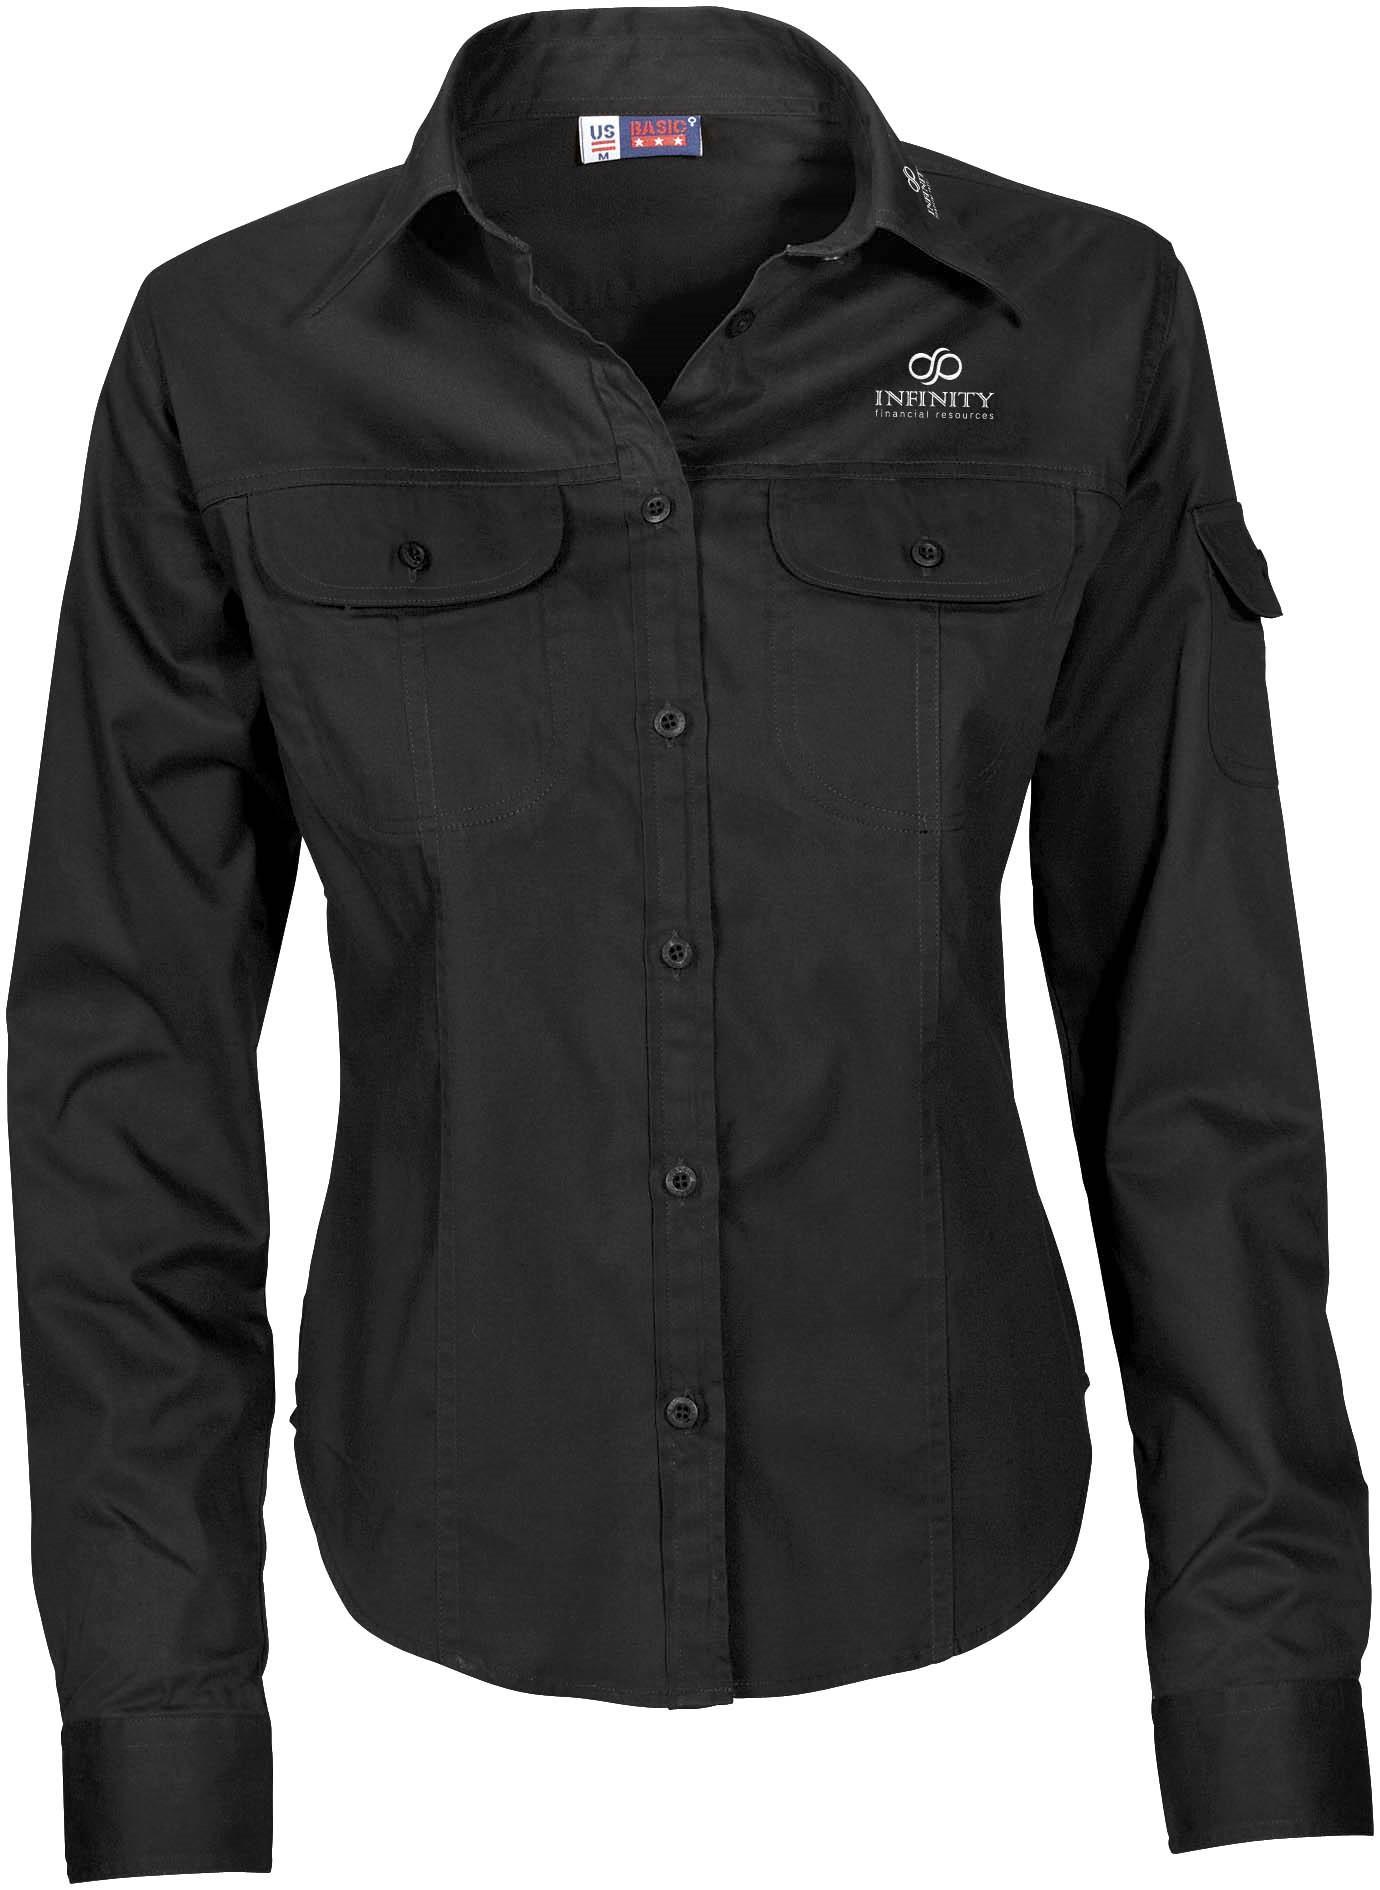 Ladies Long Sleeve Phoenix Shirt - Black Only